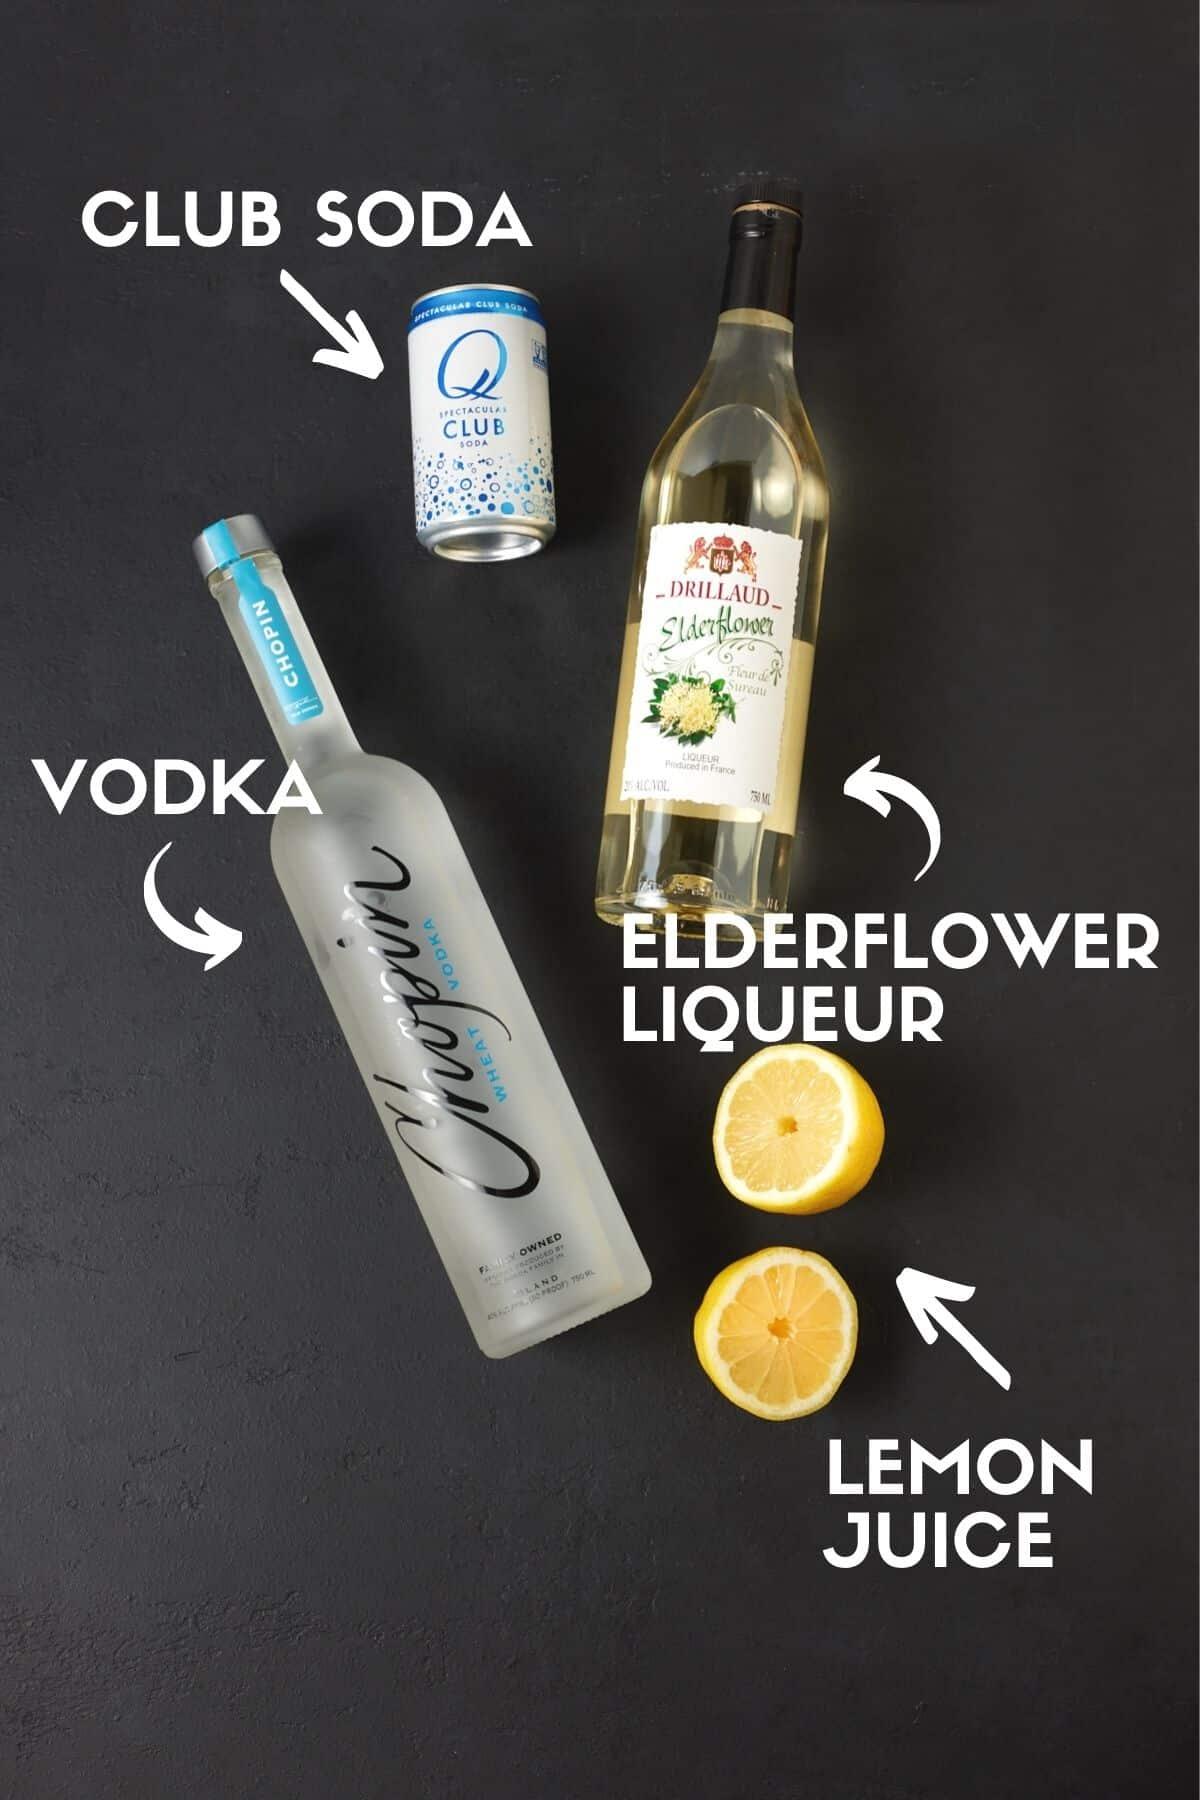 Ingredients for Elderflower Vodka Soda drink, including vodka, club soda and lemon juice.